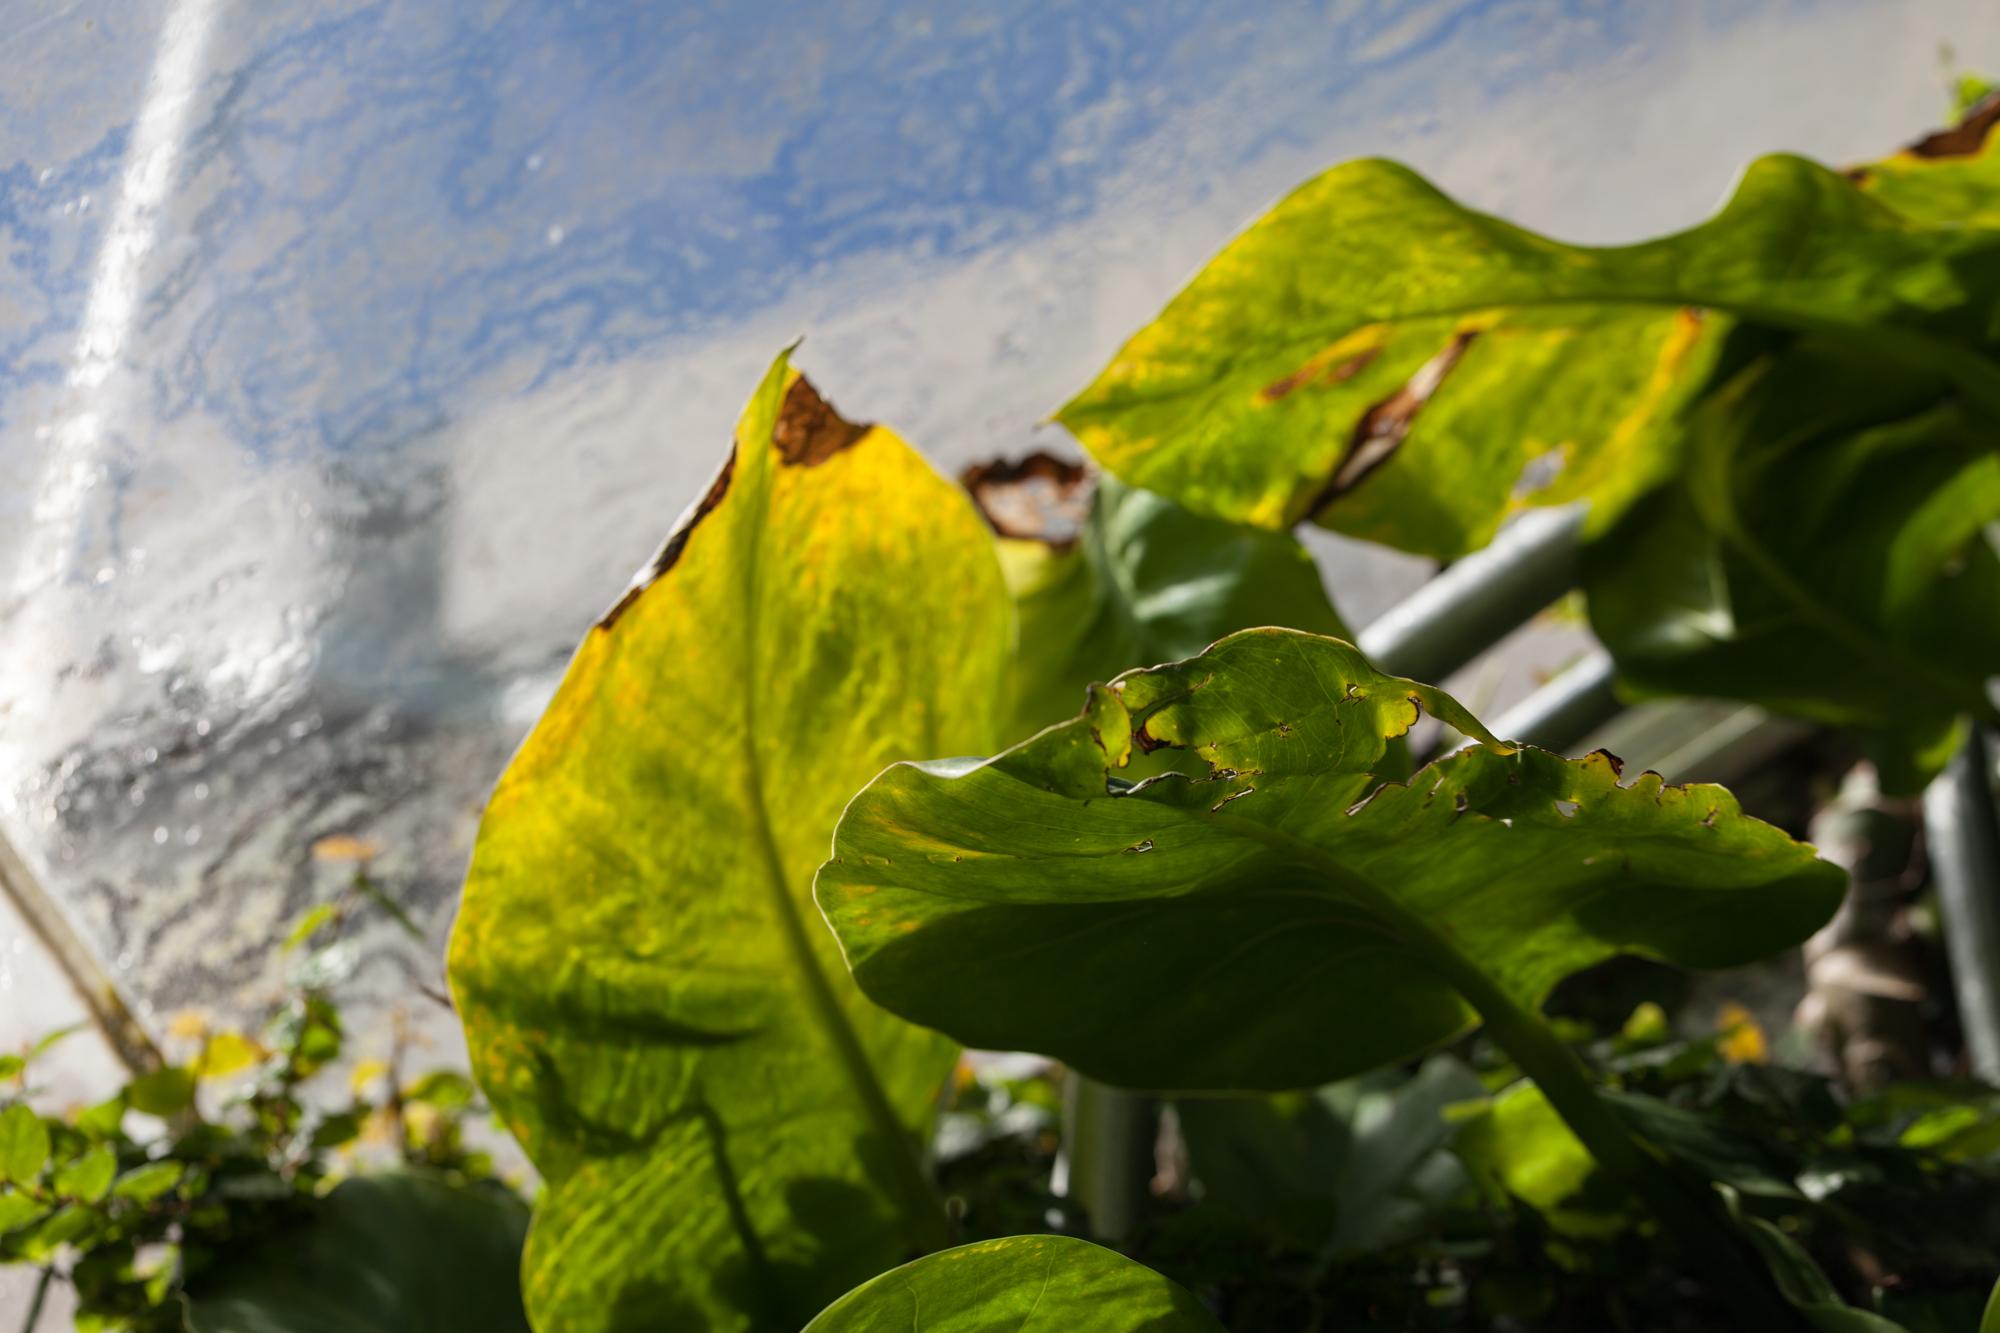 pothos-allan-garden-conservatory.jpg